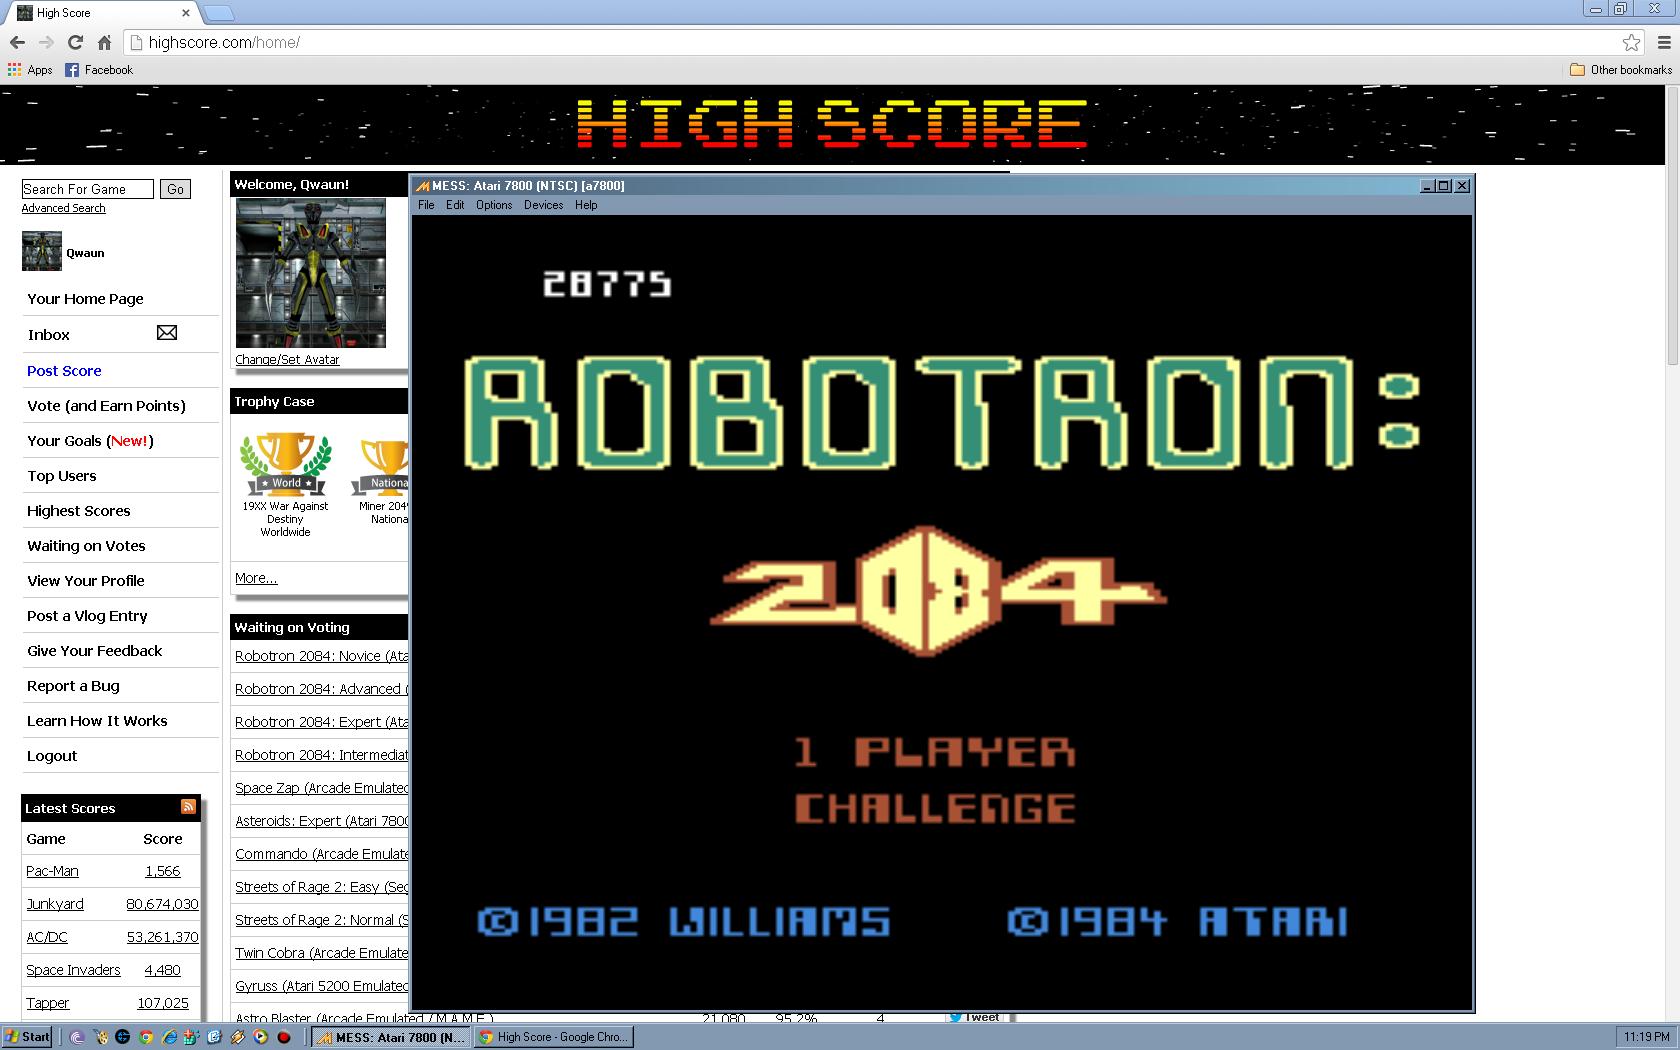 Robotron 2084: Challenge 28,775 points